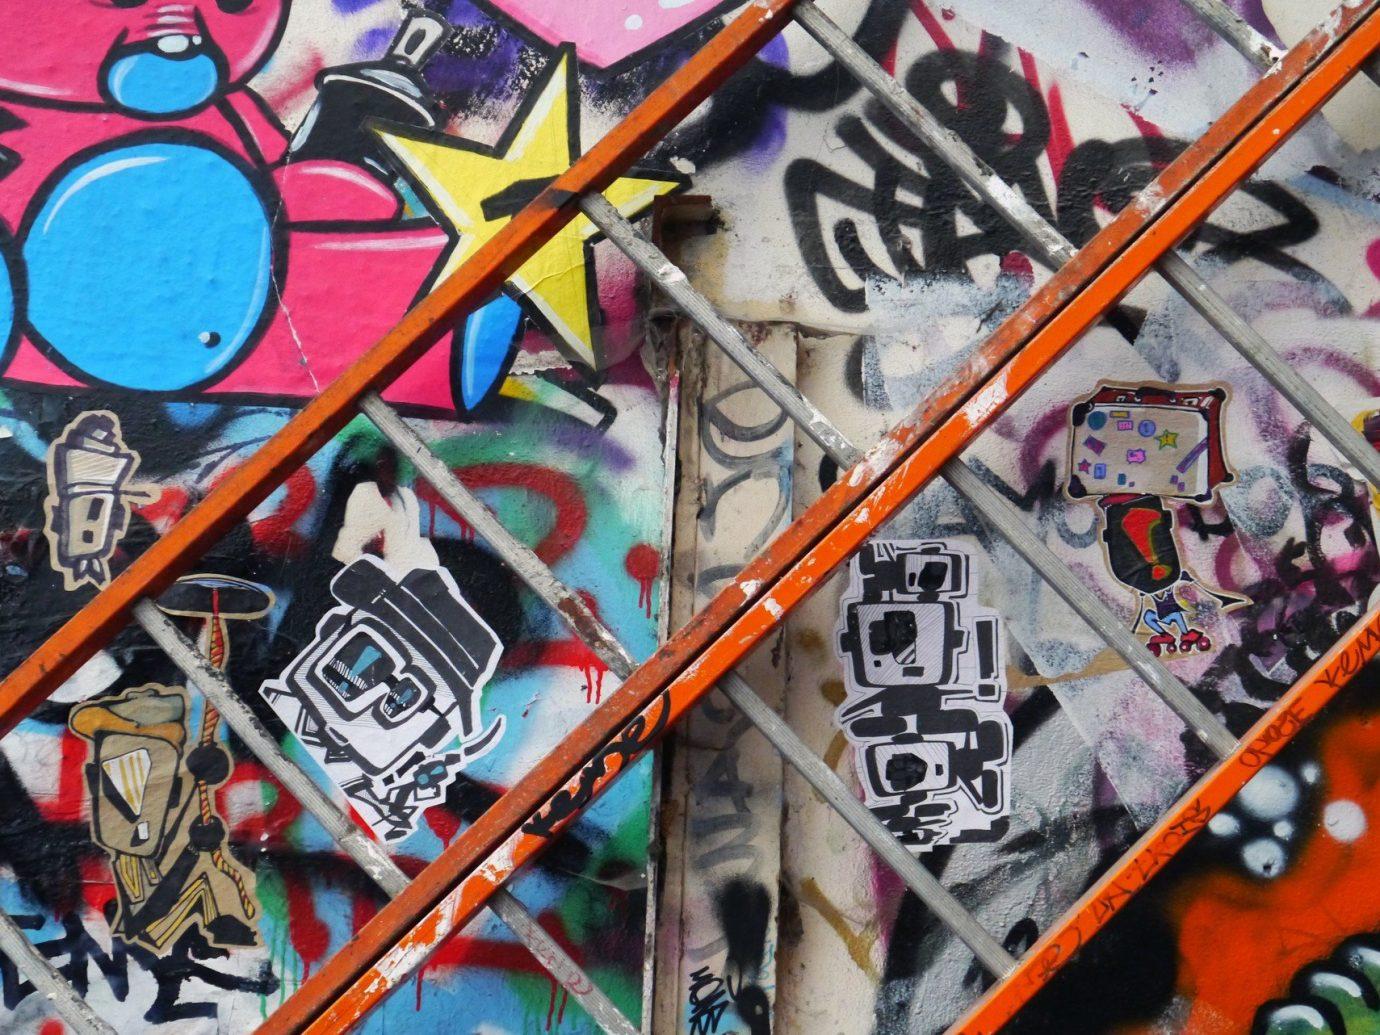 art City colorful graffiti ladders street art Trip Ideas urban